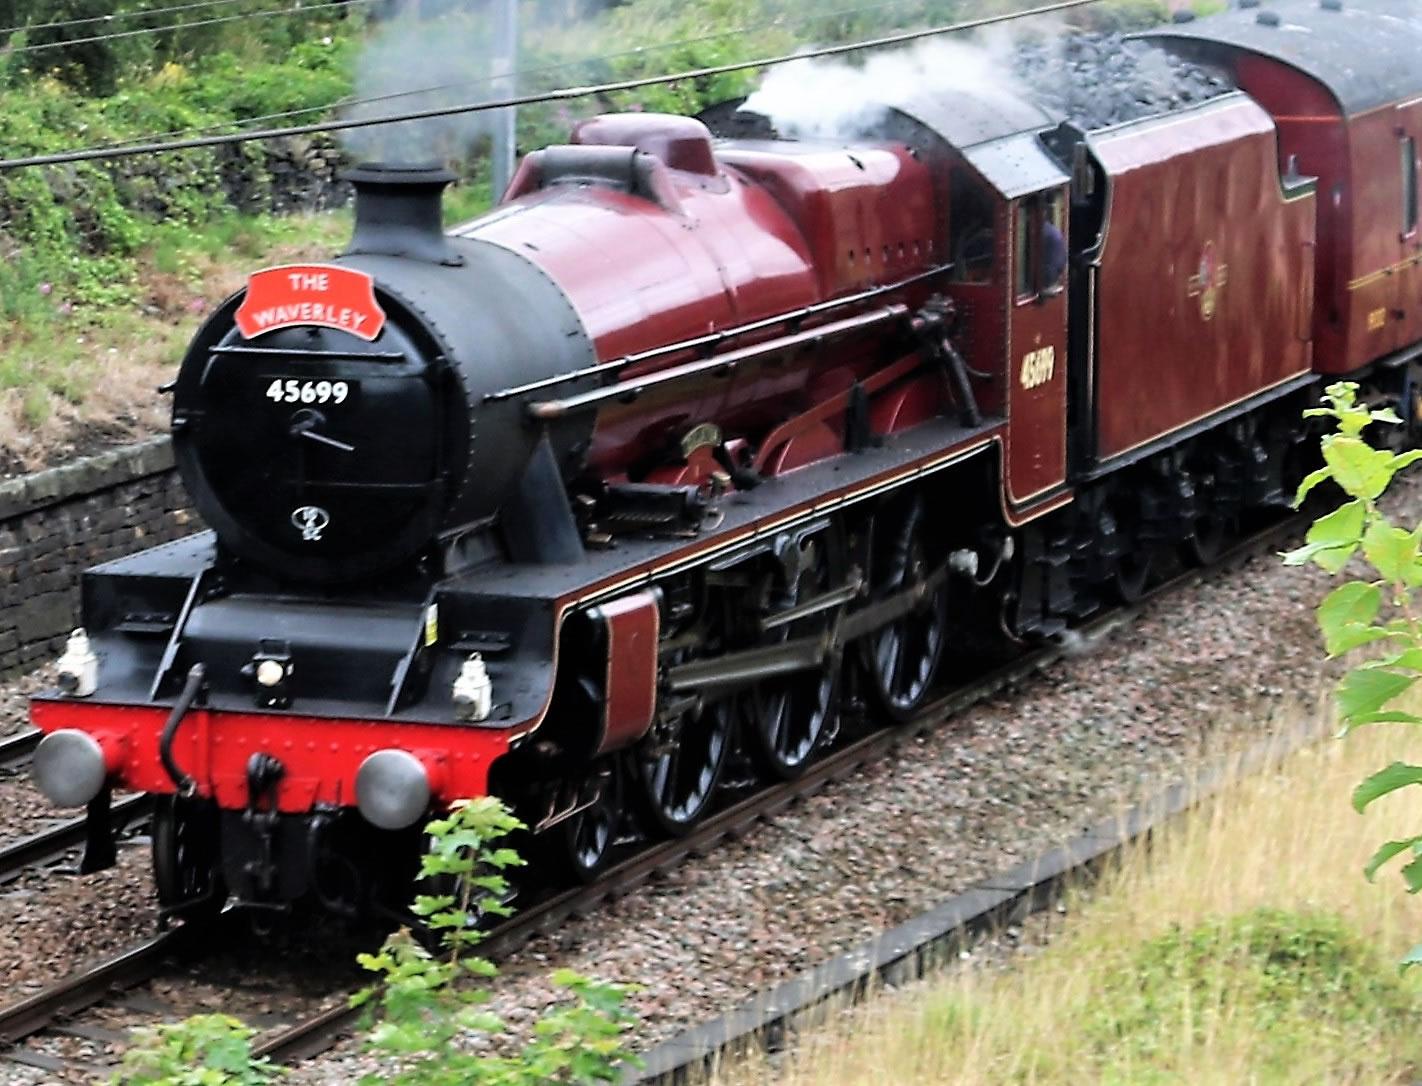 London Midland and Scottish (LMS) Jubile